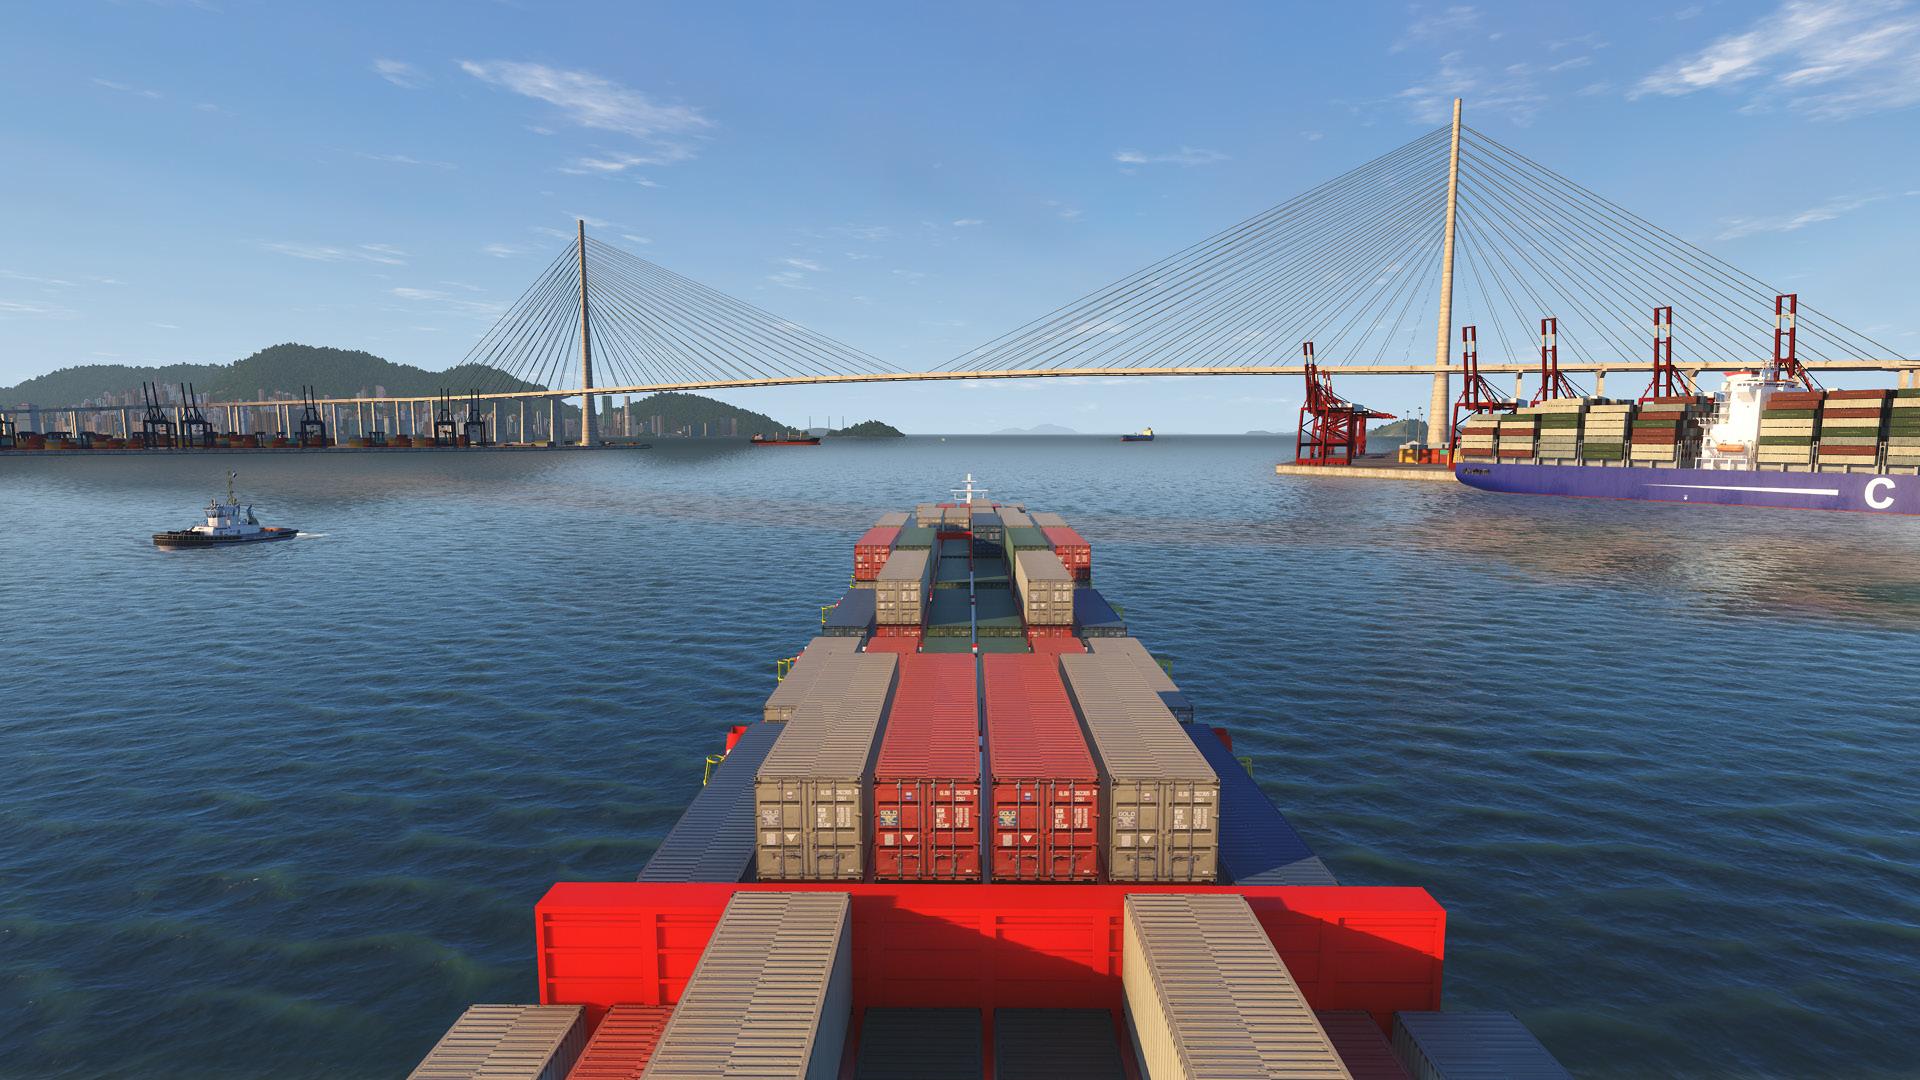 NAUTIS Maritime Simulator - Hong Kong